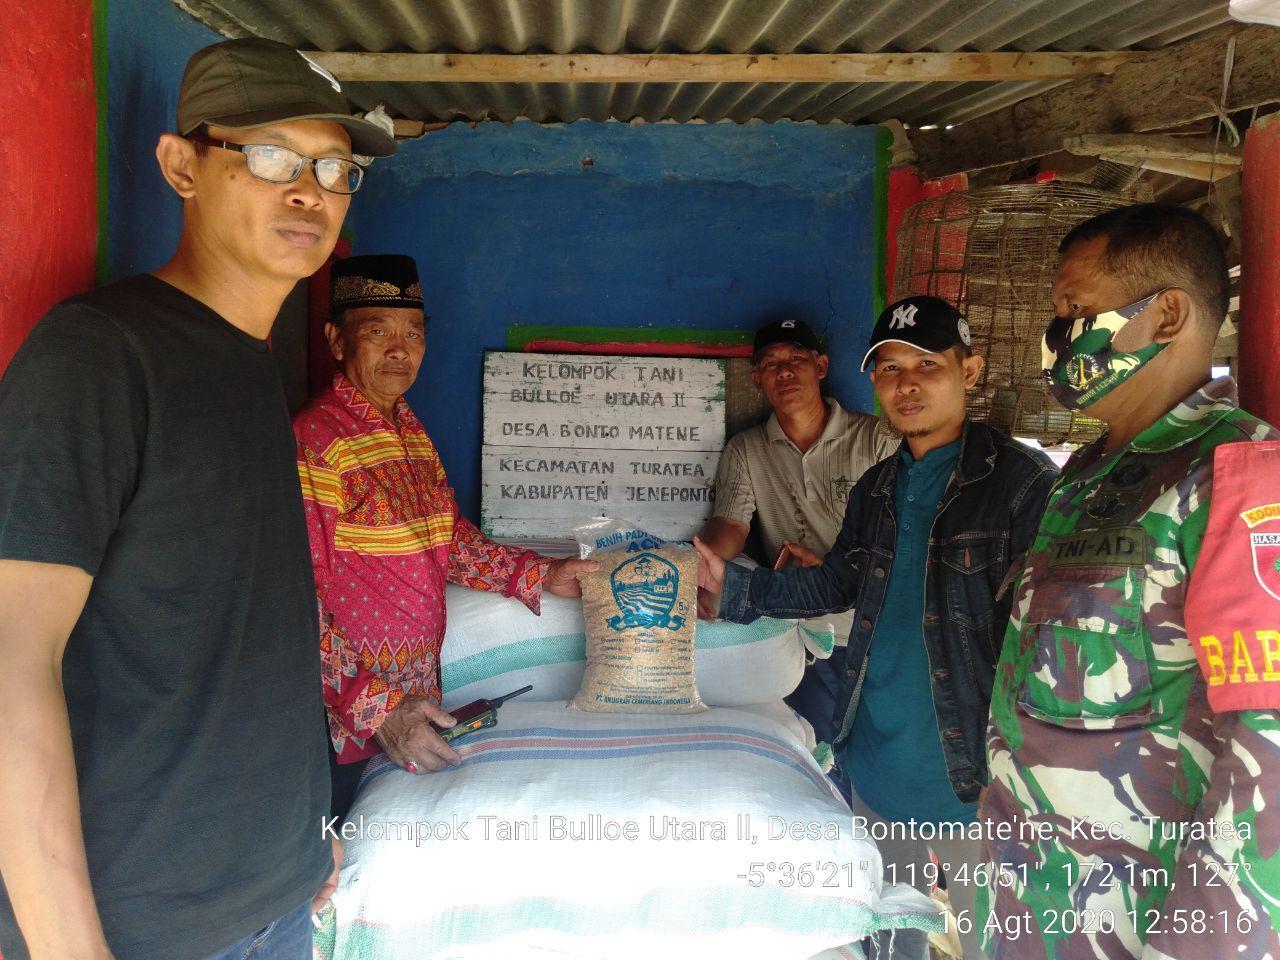 Seksi Tanaman Pangan Dinas Pertanian Jeneponto Dampingi Penyaluran Bibit Padi di Turatea